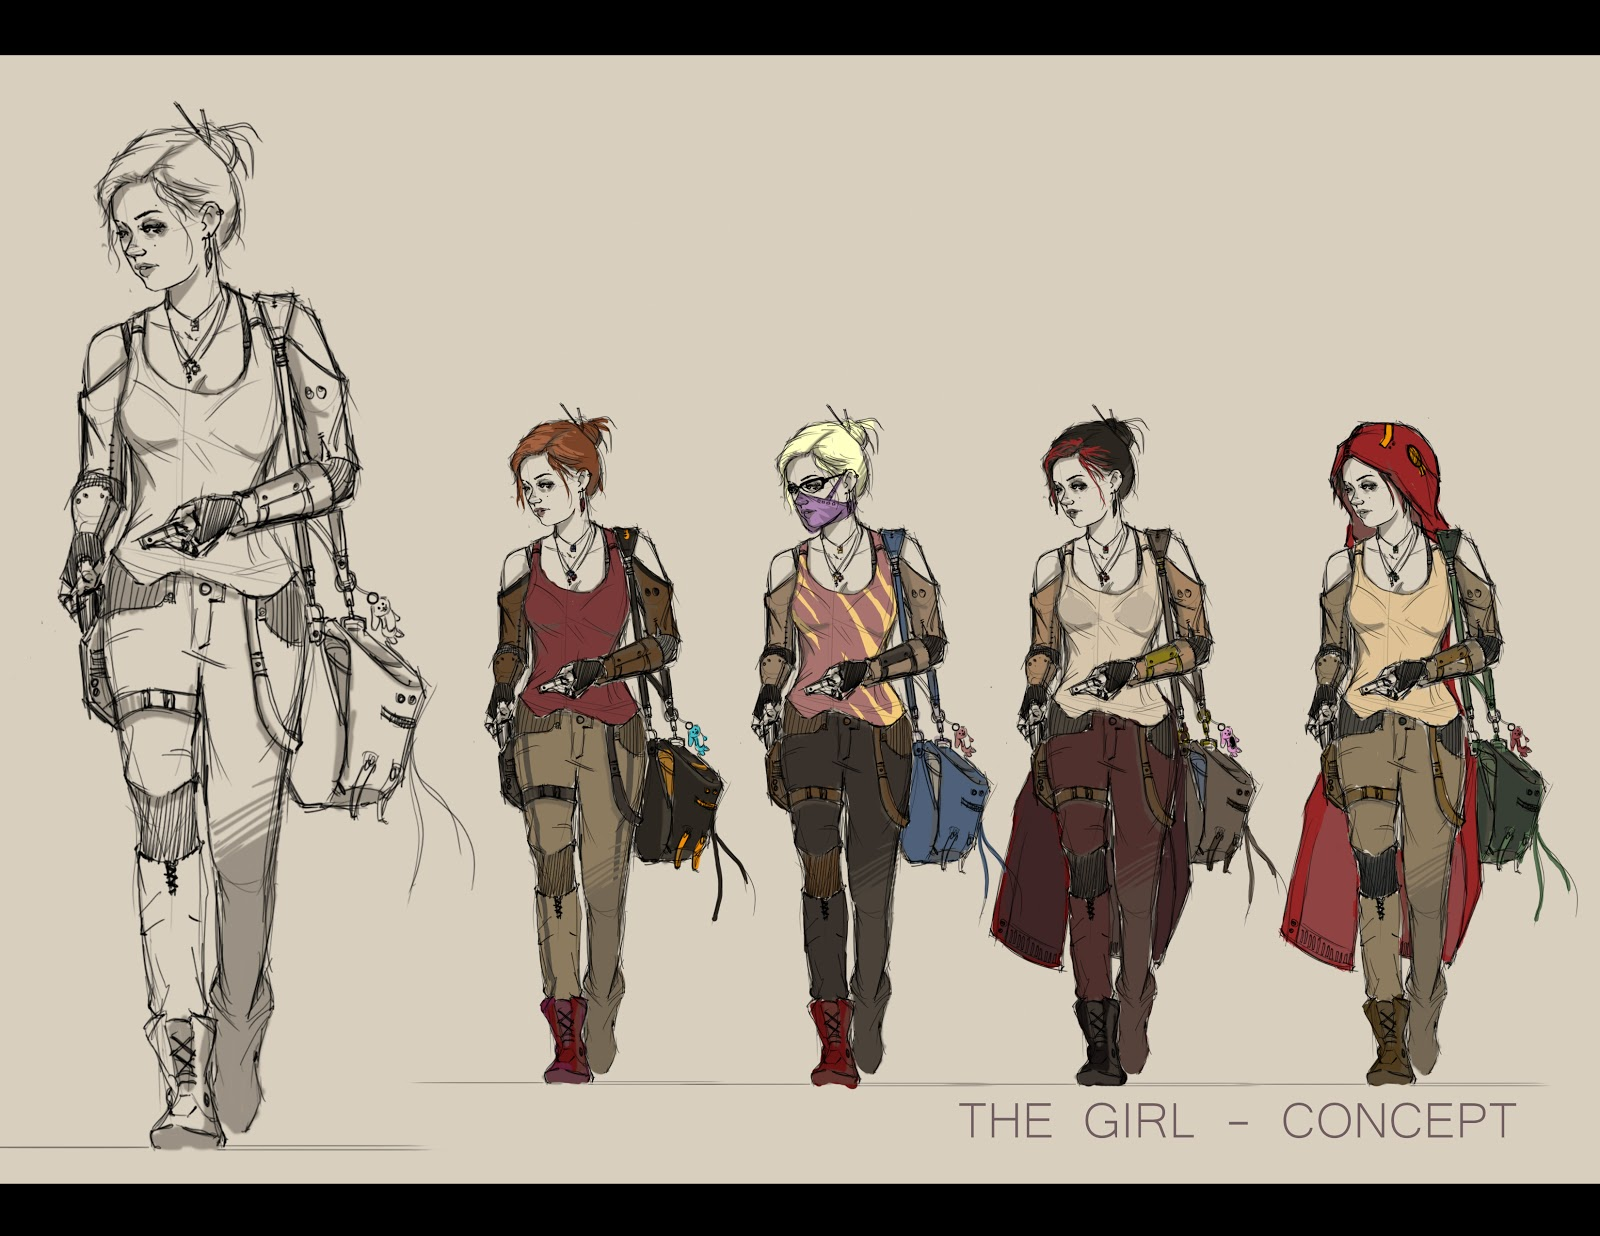 Character Design Concept Art Tutorial : Moragot s art some recent work concept